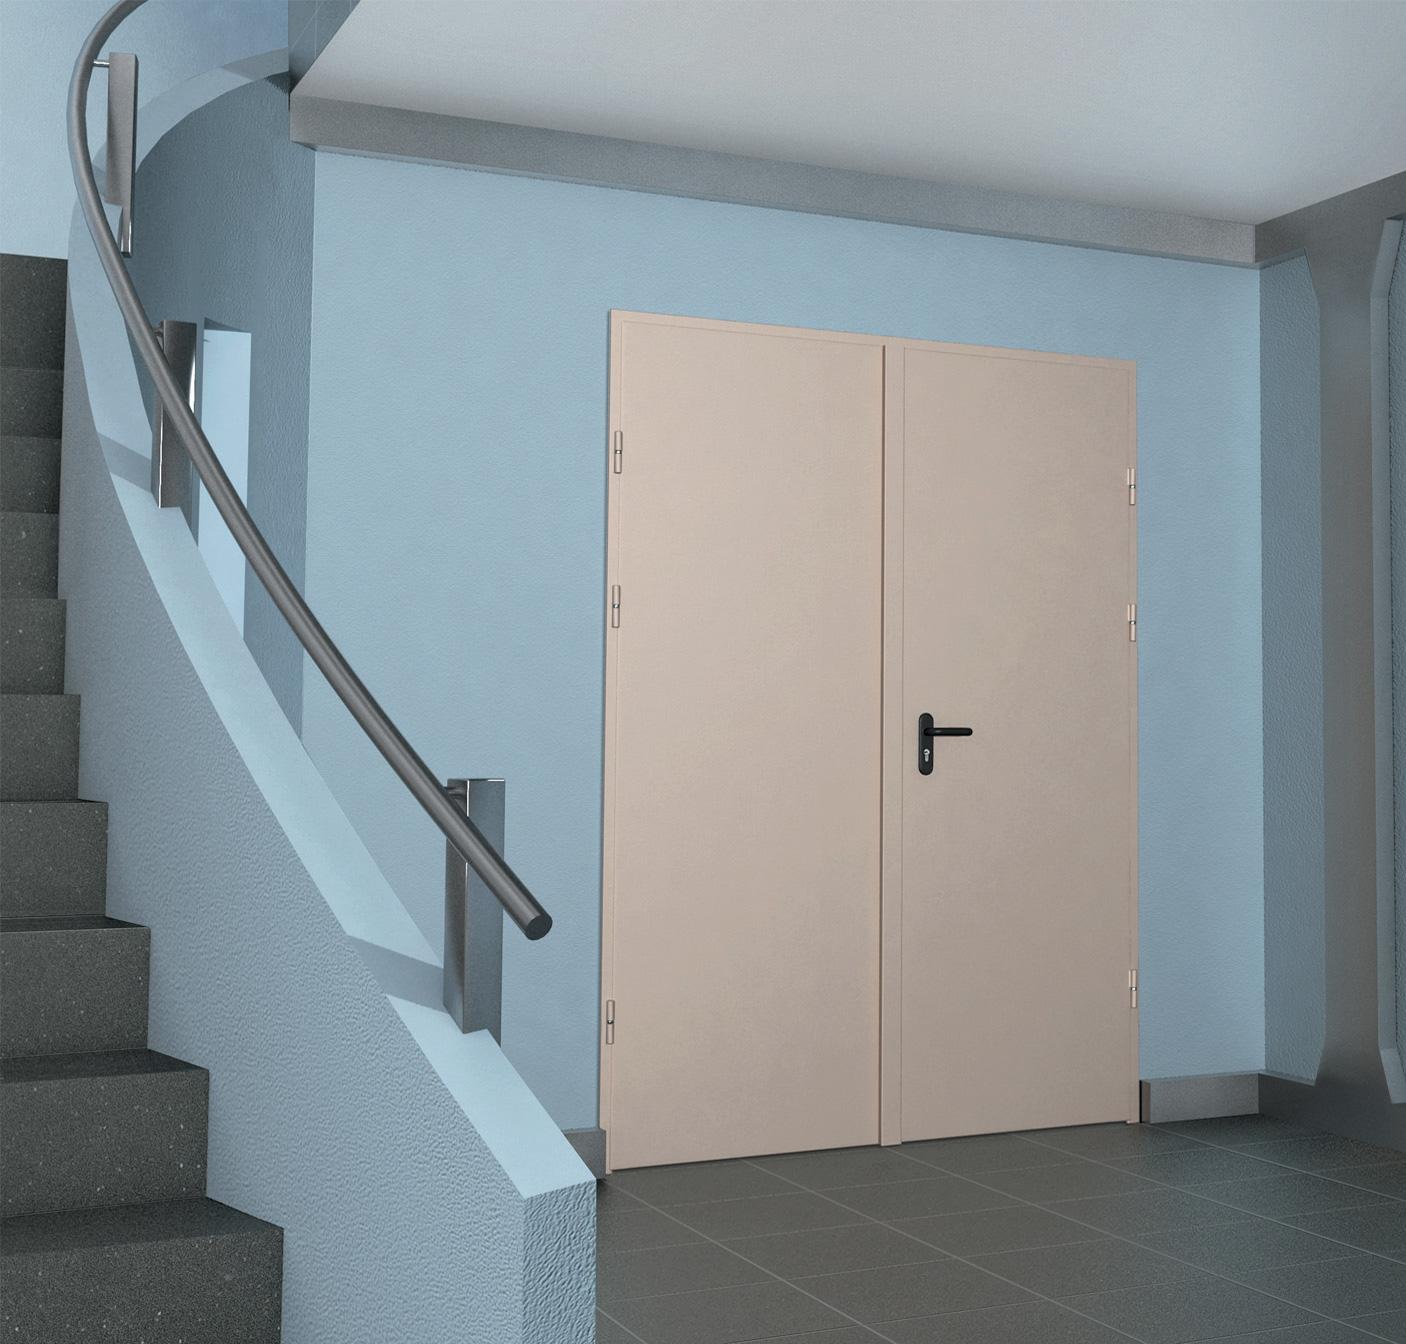 kapnu telpas durvis